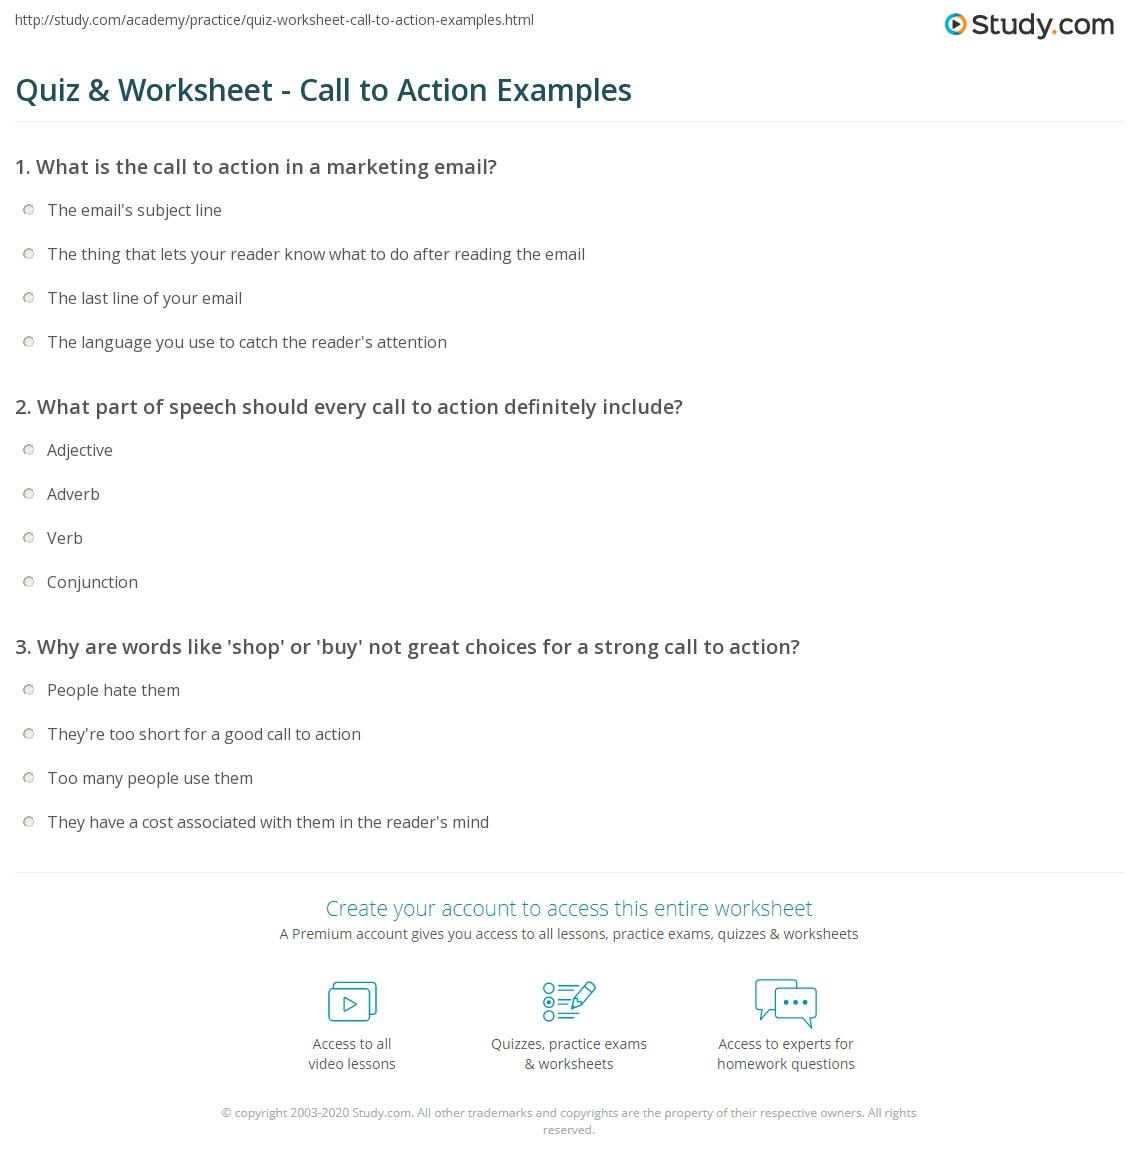 call to action speech ideas